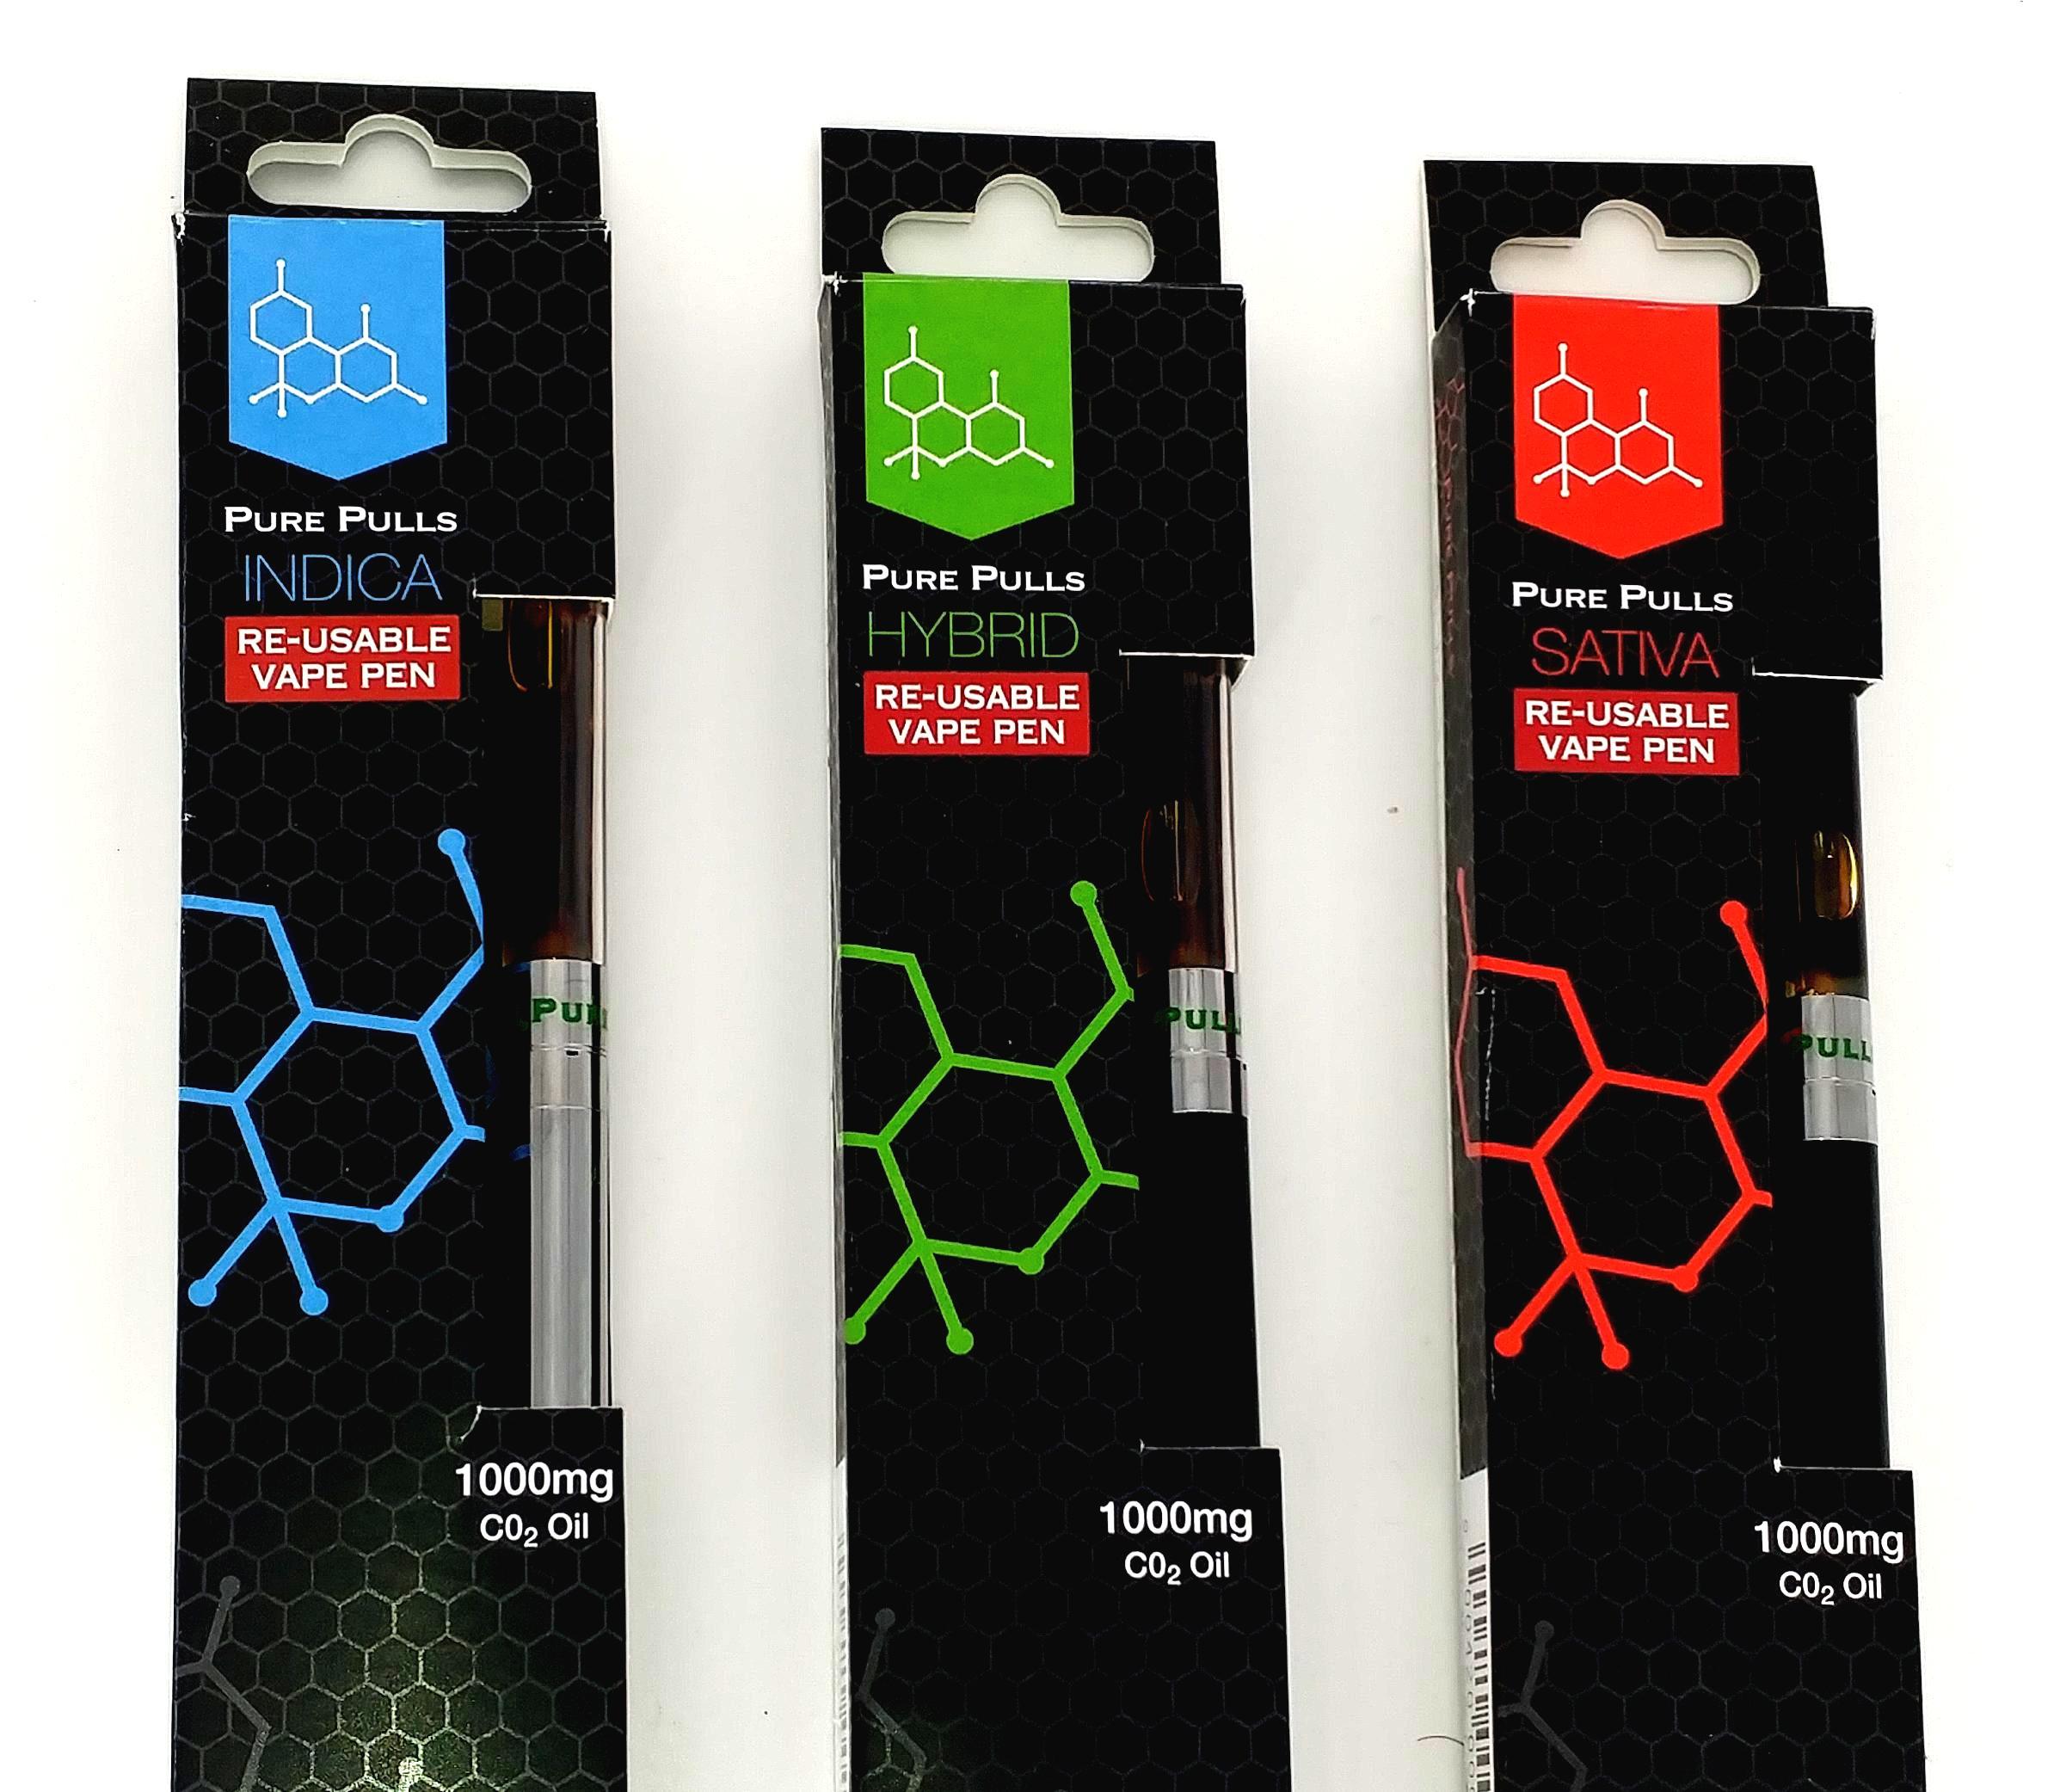 pure pull pens e1508634373879 boost 2 wetfs8